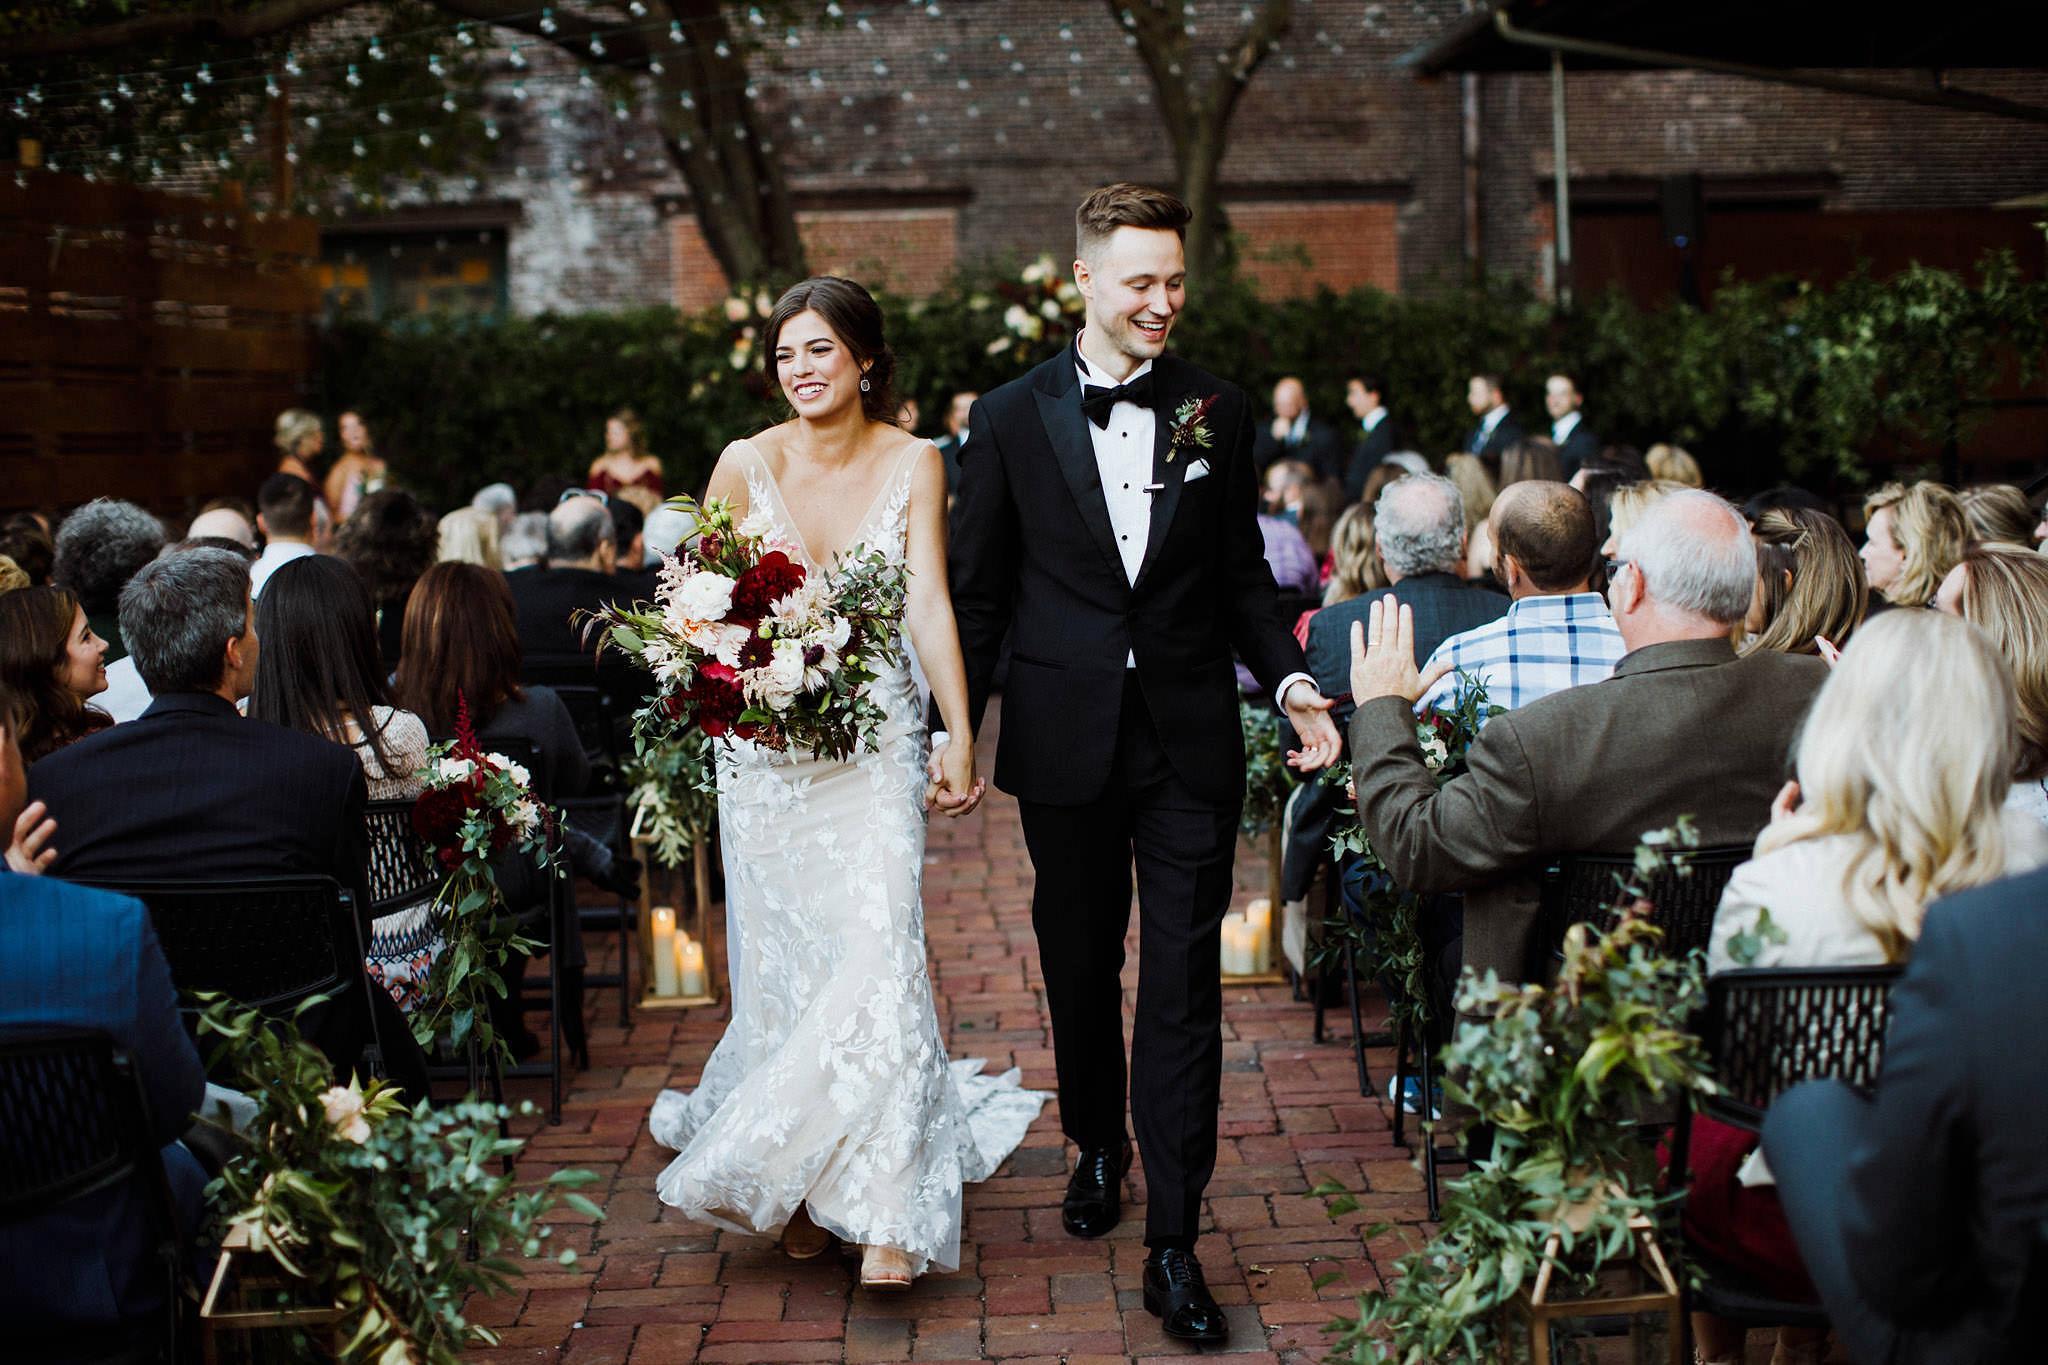 Feast of Fancy-Hobbs Building Wedding_Cinder Block Brewery Wedding_Kindling Wedding Photography_08.JPG